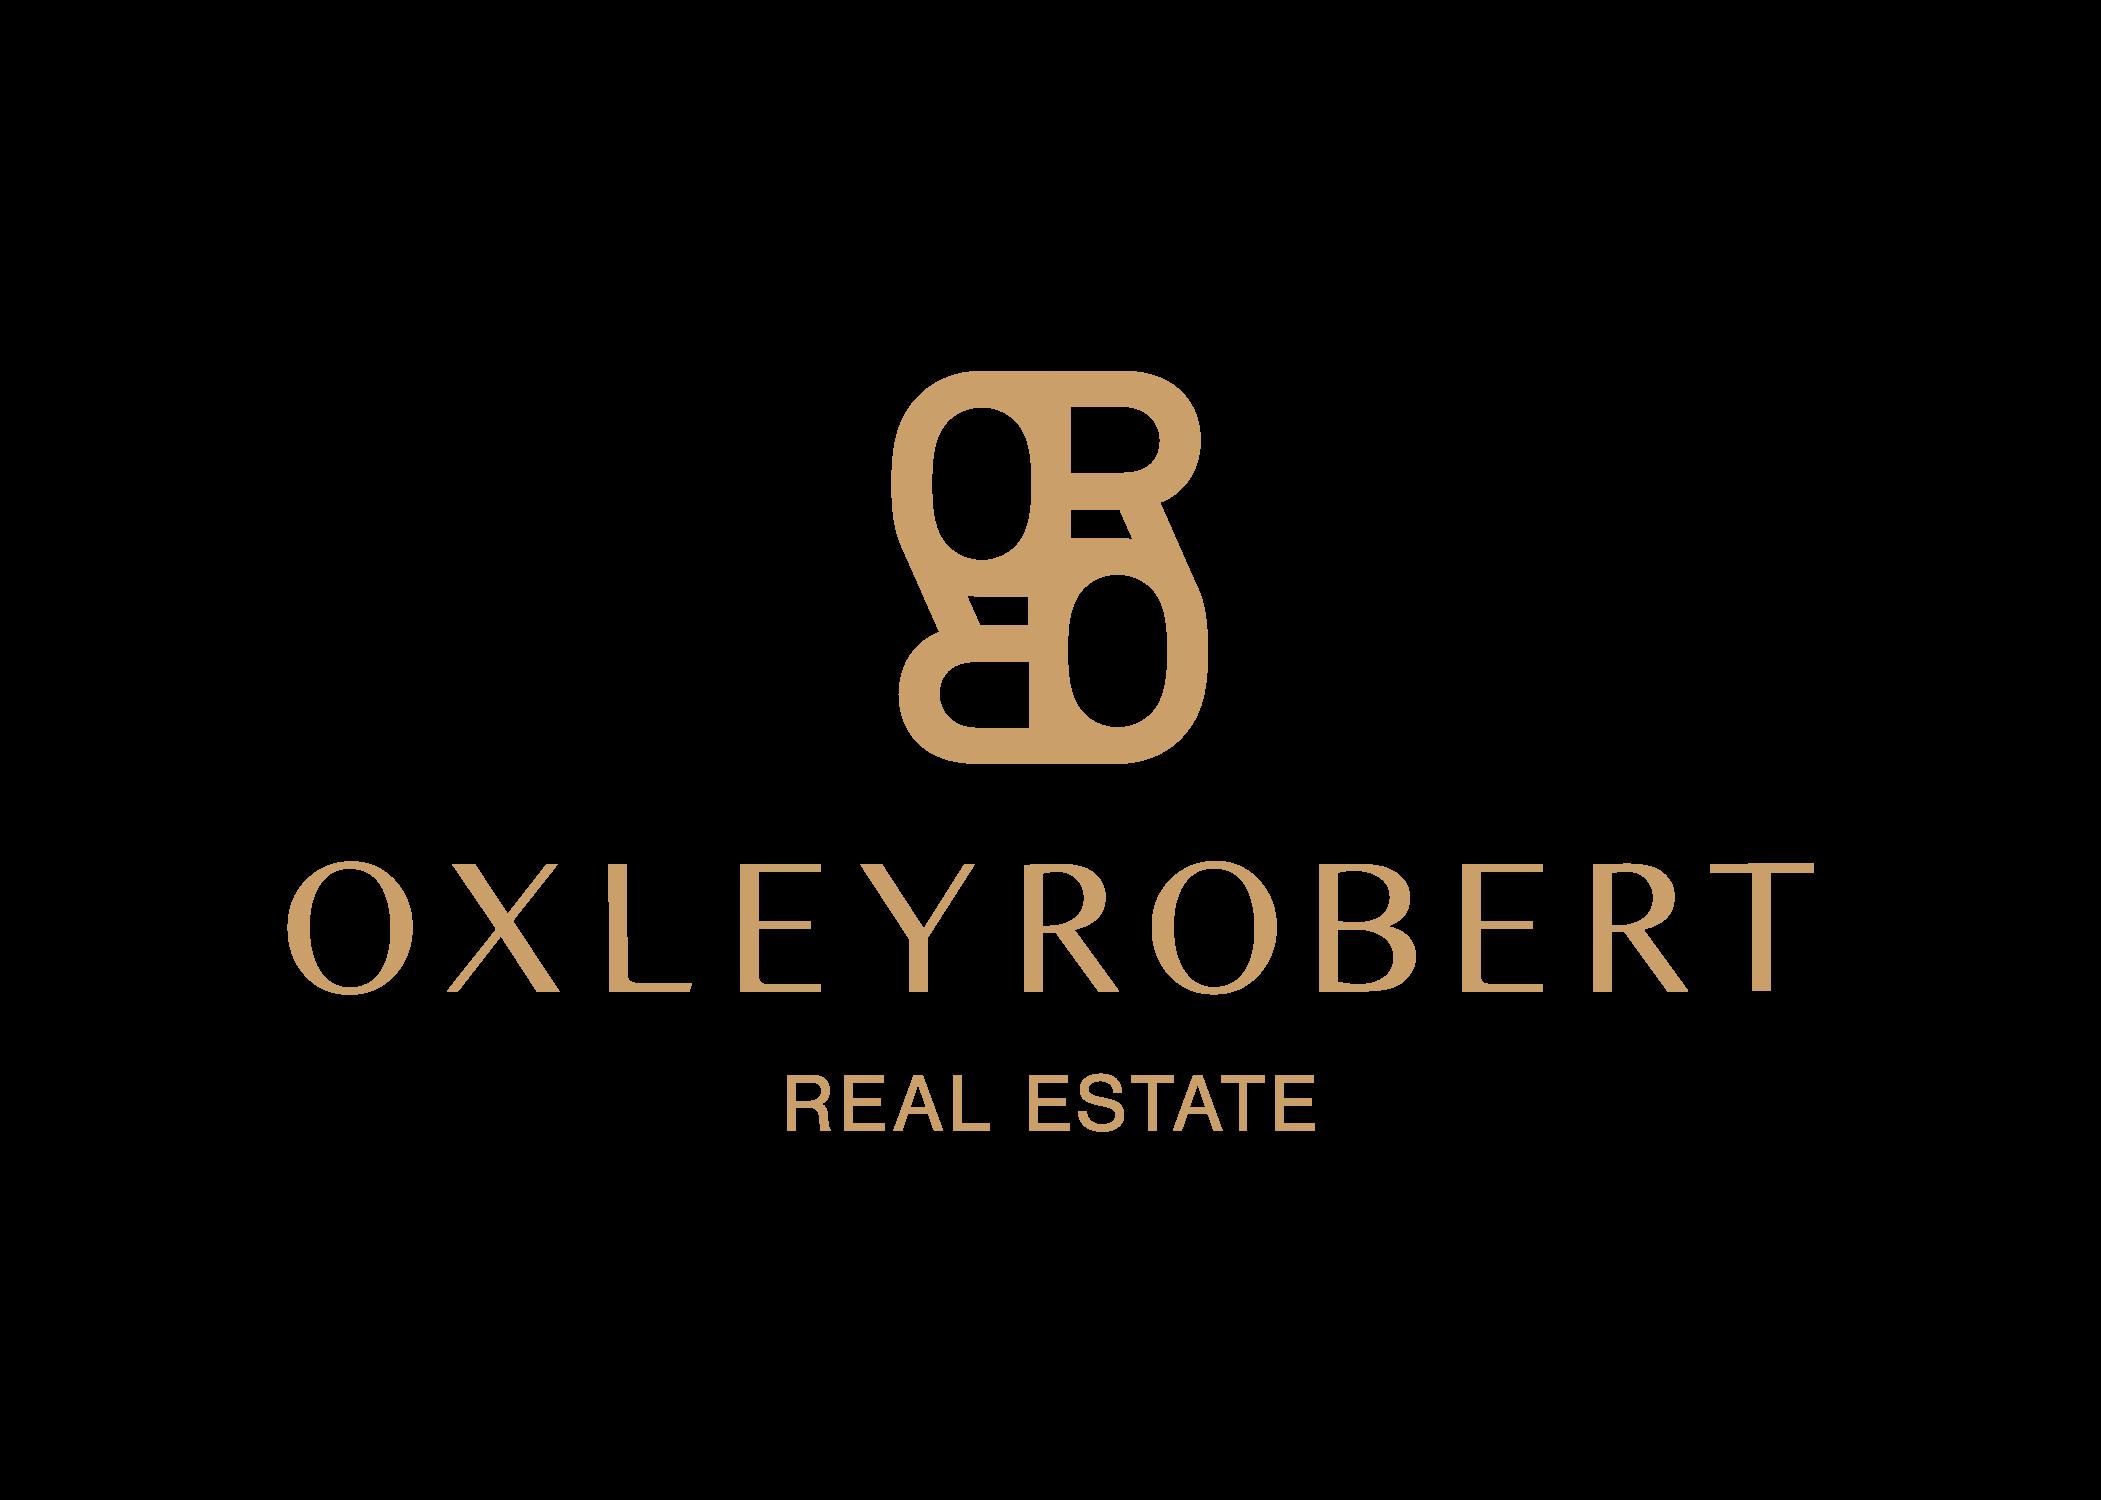 Royal Lepage Terrequity Oxley Robert Real Estate, Brokerage